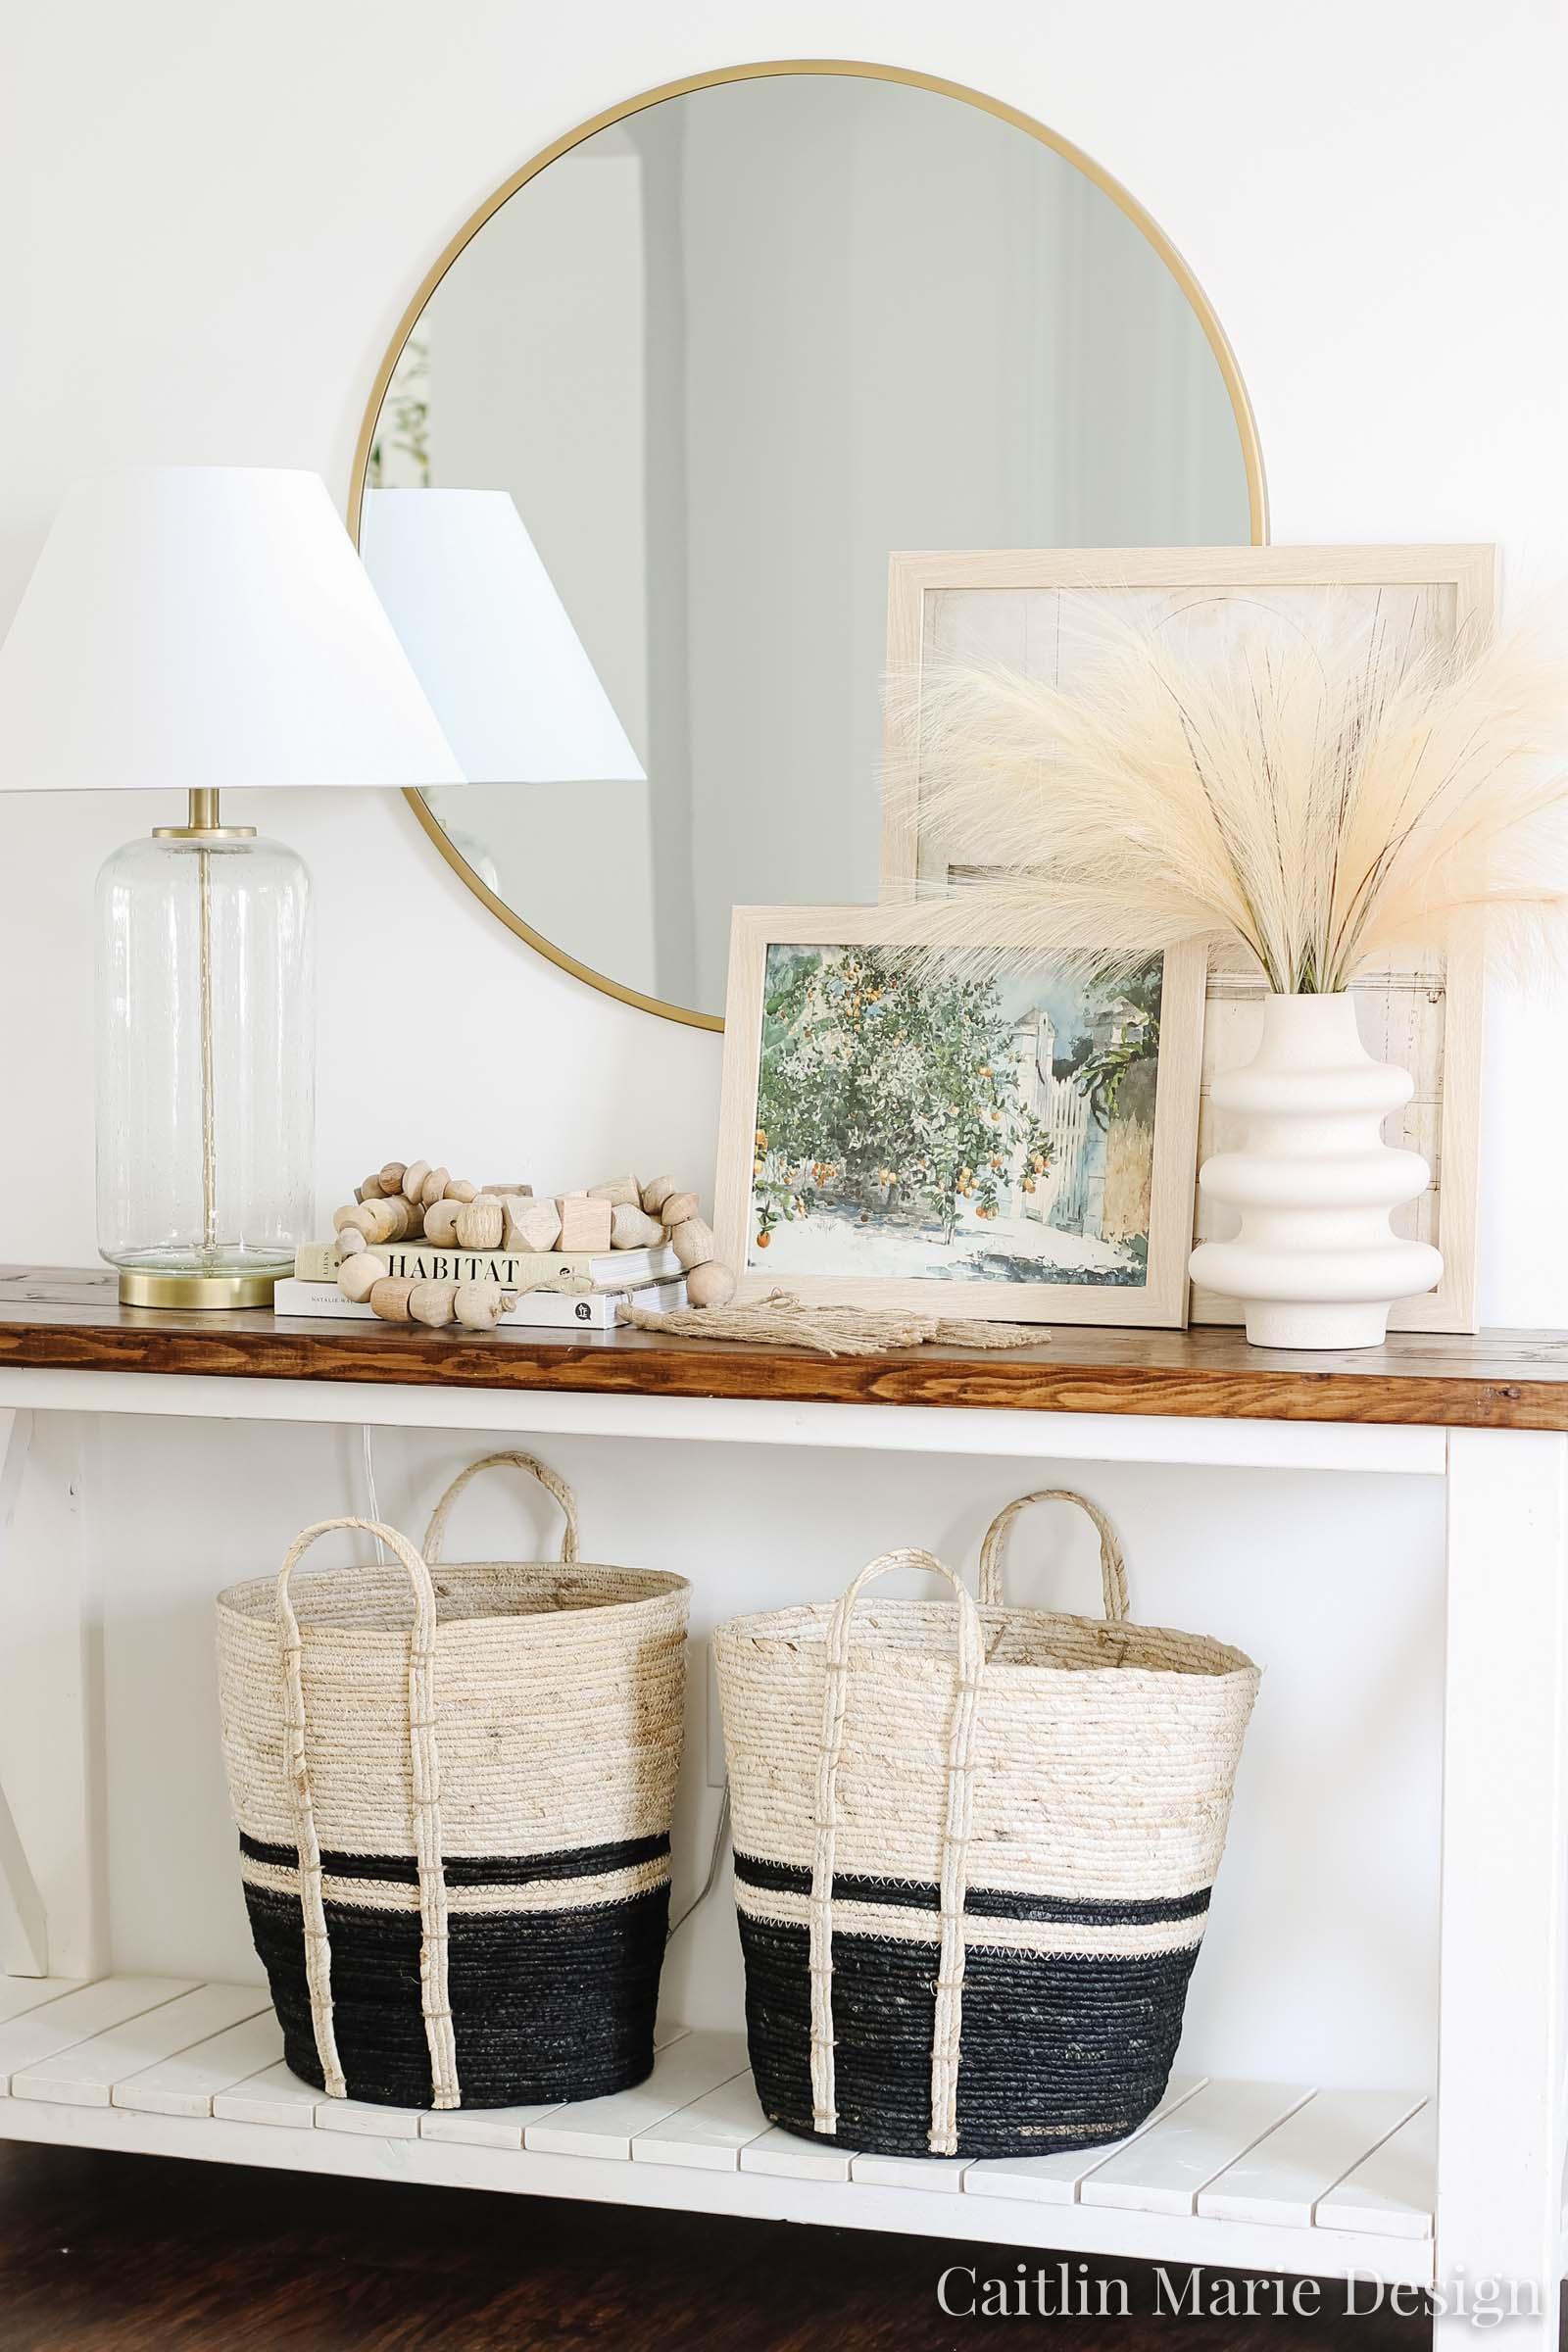 Minimalist Fall Decor | Fall Home Tour 2020 | coastal farmhouse, modern traditional, California casual, McGee and Co decor, vintage artwork, pampas grass, entryway